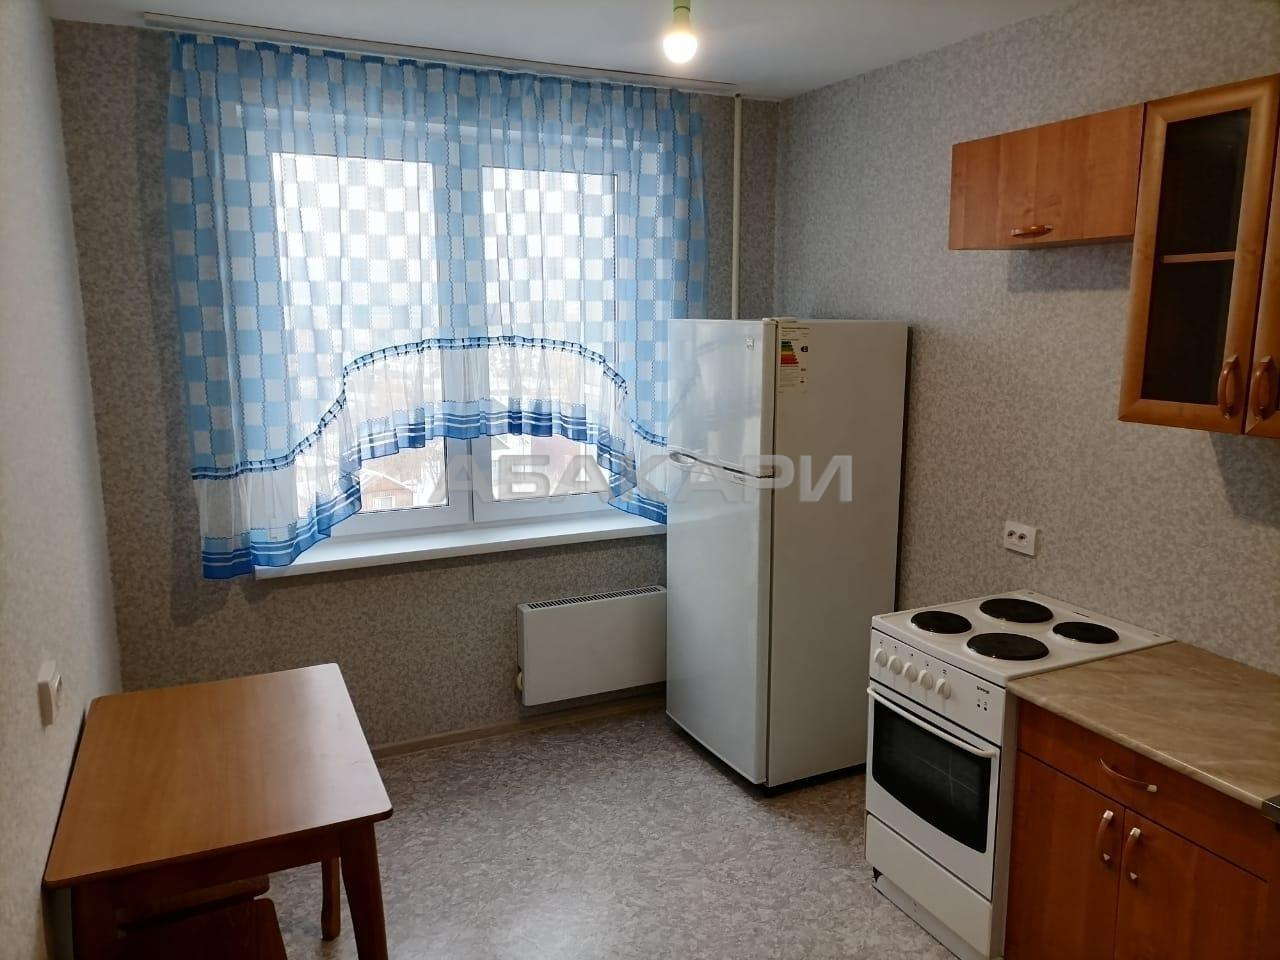 1к квартира Лесопарковая улица, 3 | 15000 | аренда в Красноярске фото 0